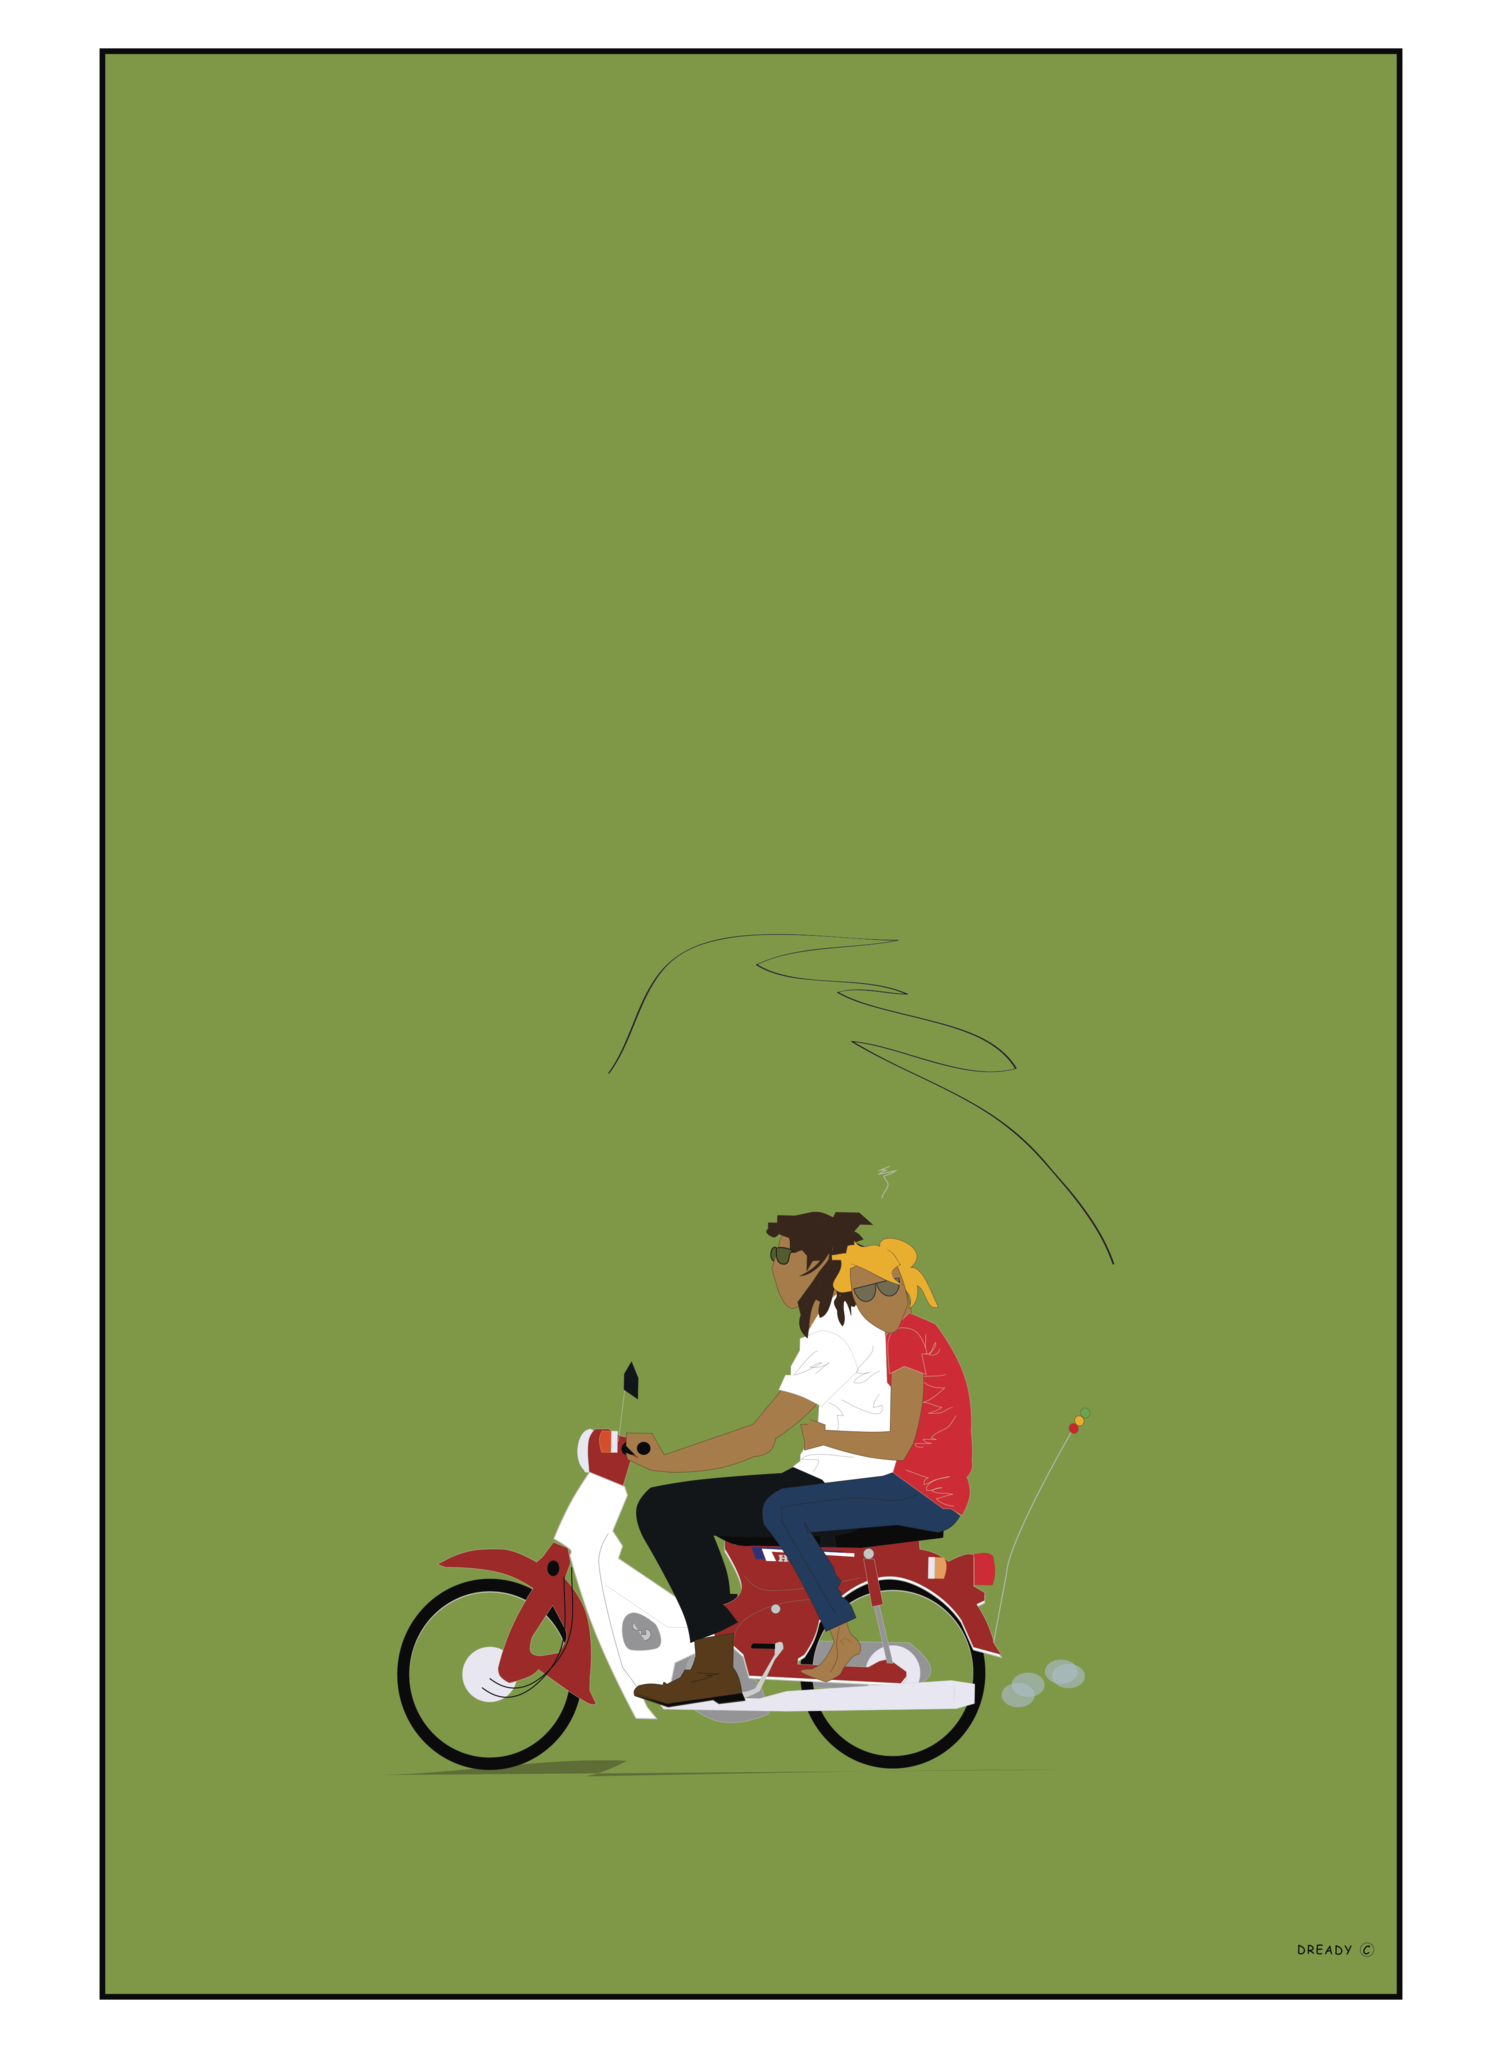 Honda 50 - Trustafarians 2014